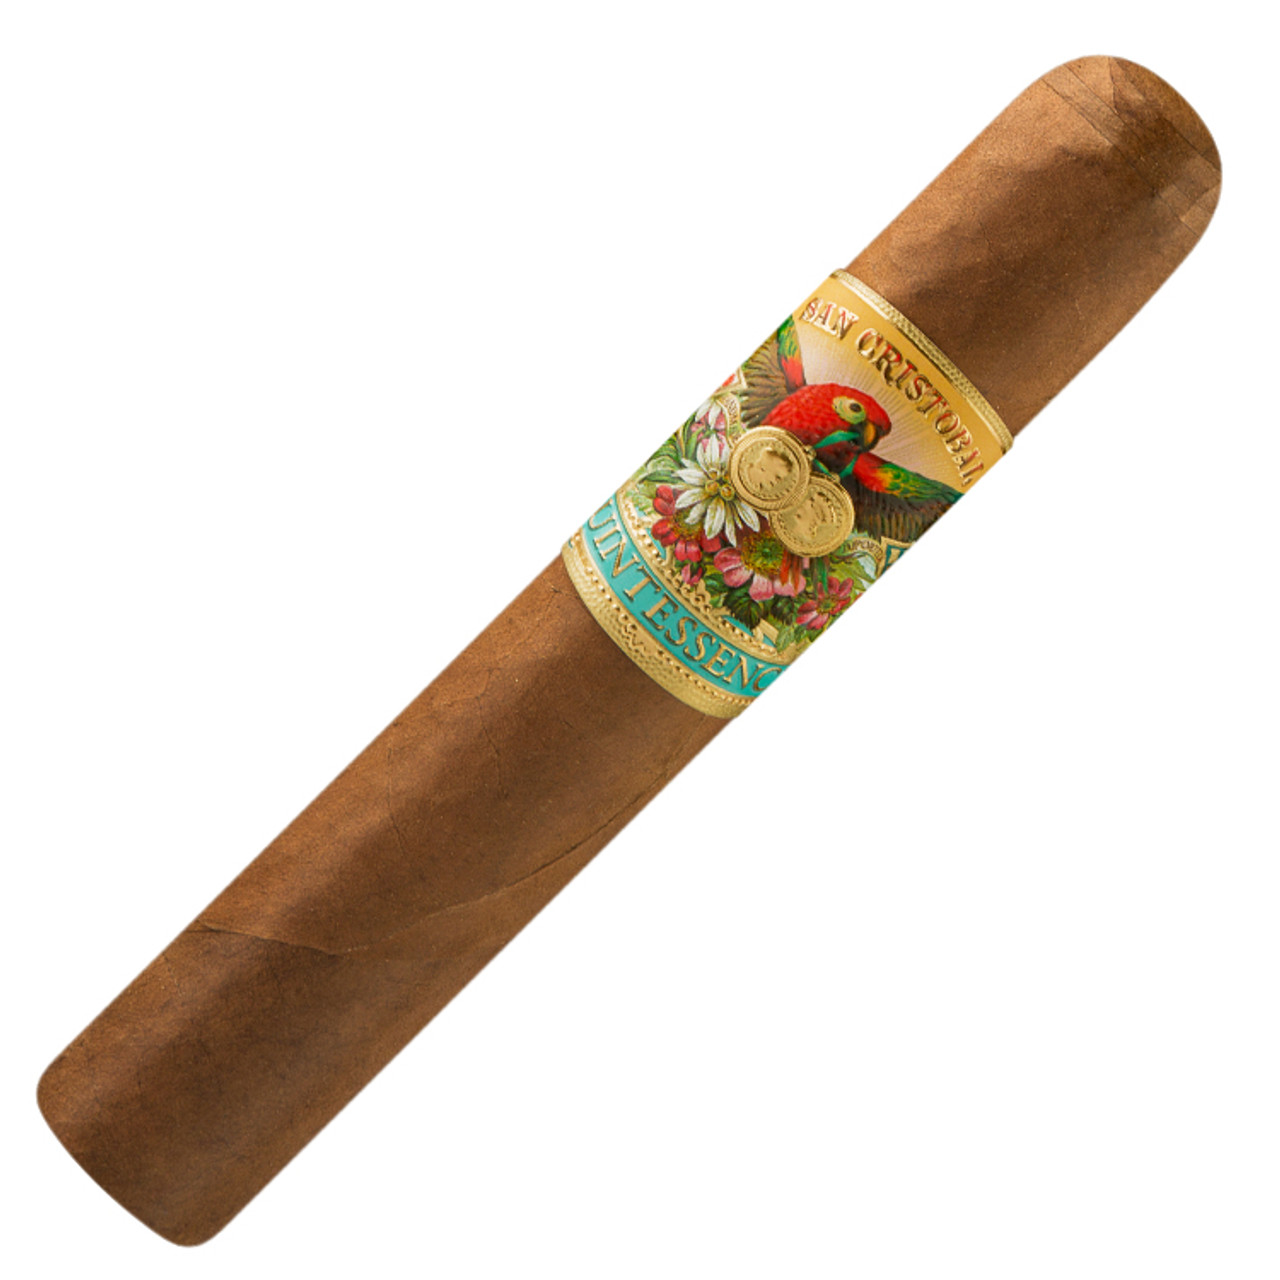 San Cristobal Quintessence Majestic Cigars - 6 x 60 (Box of 24)